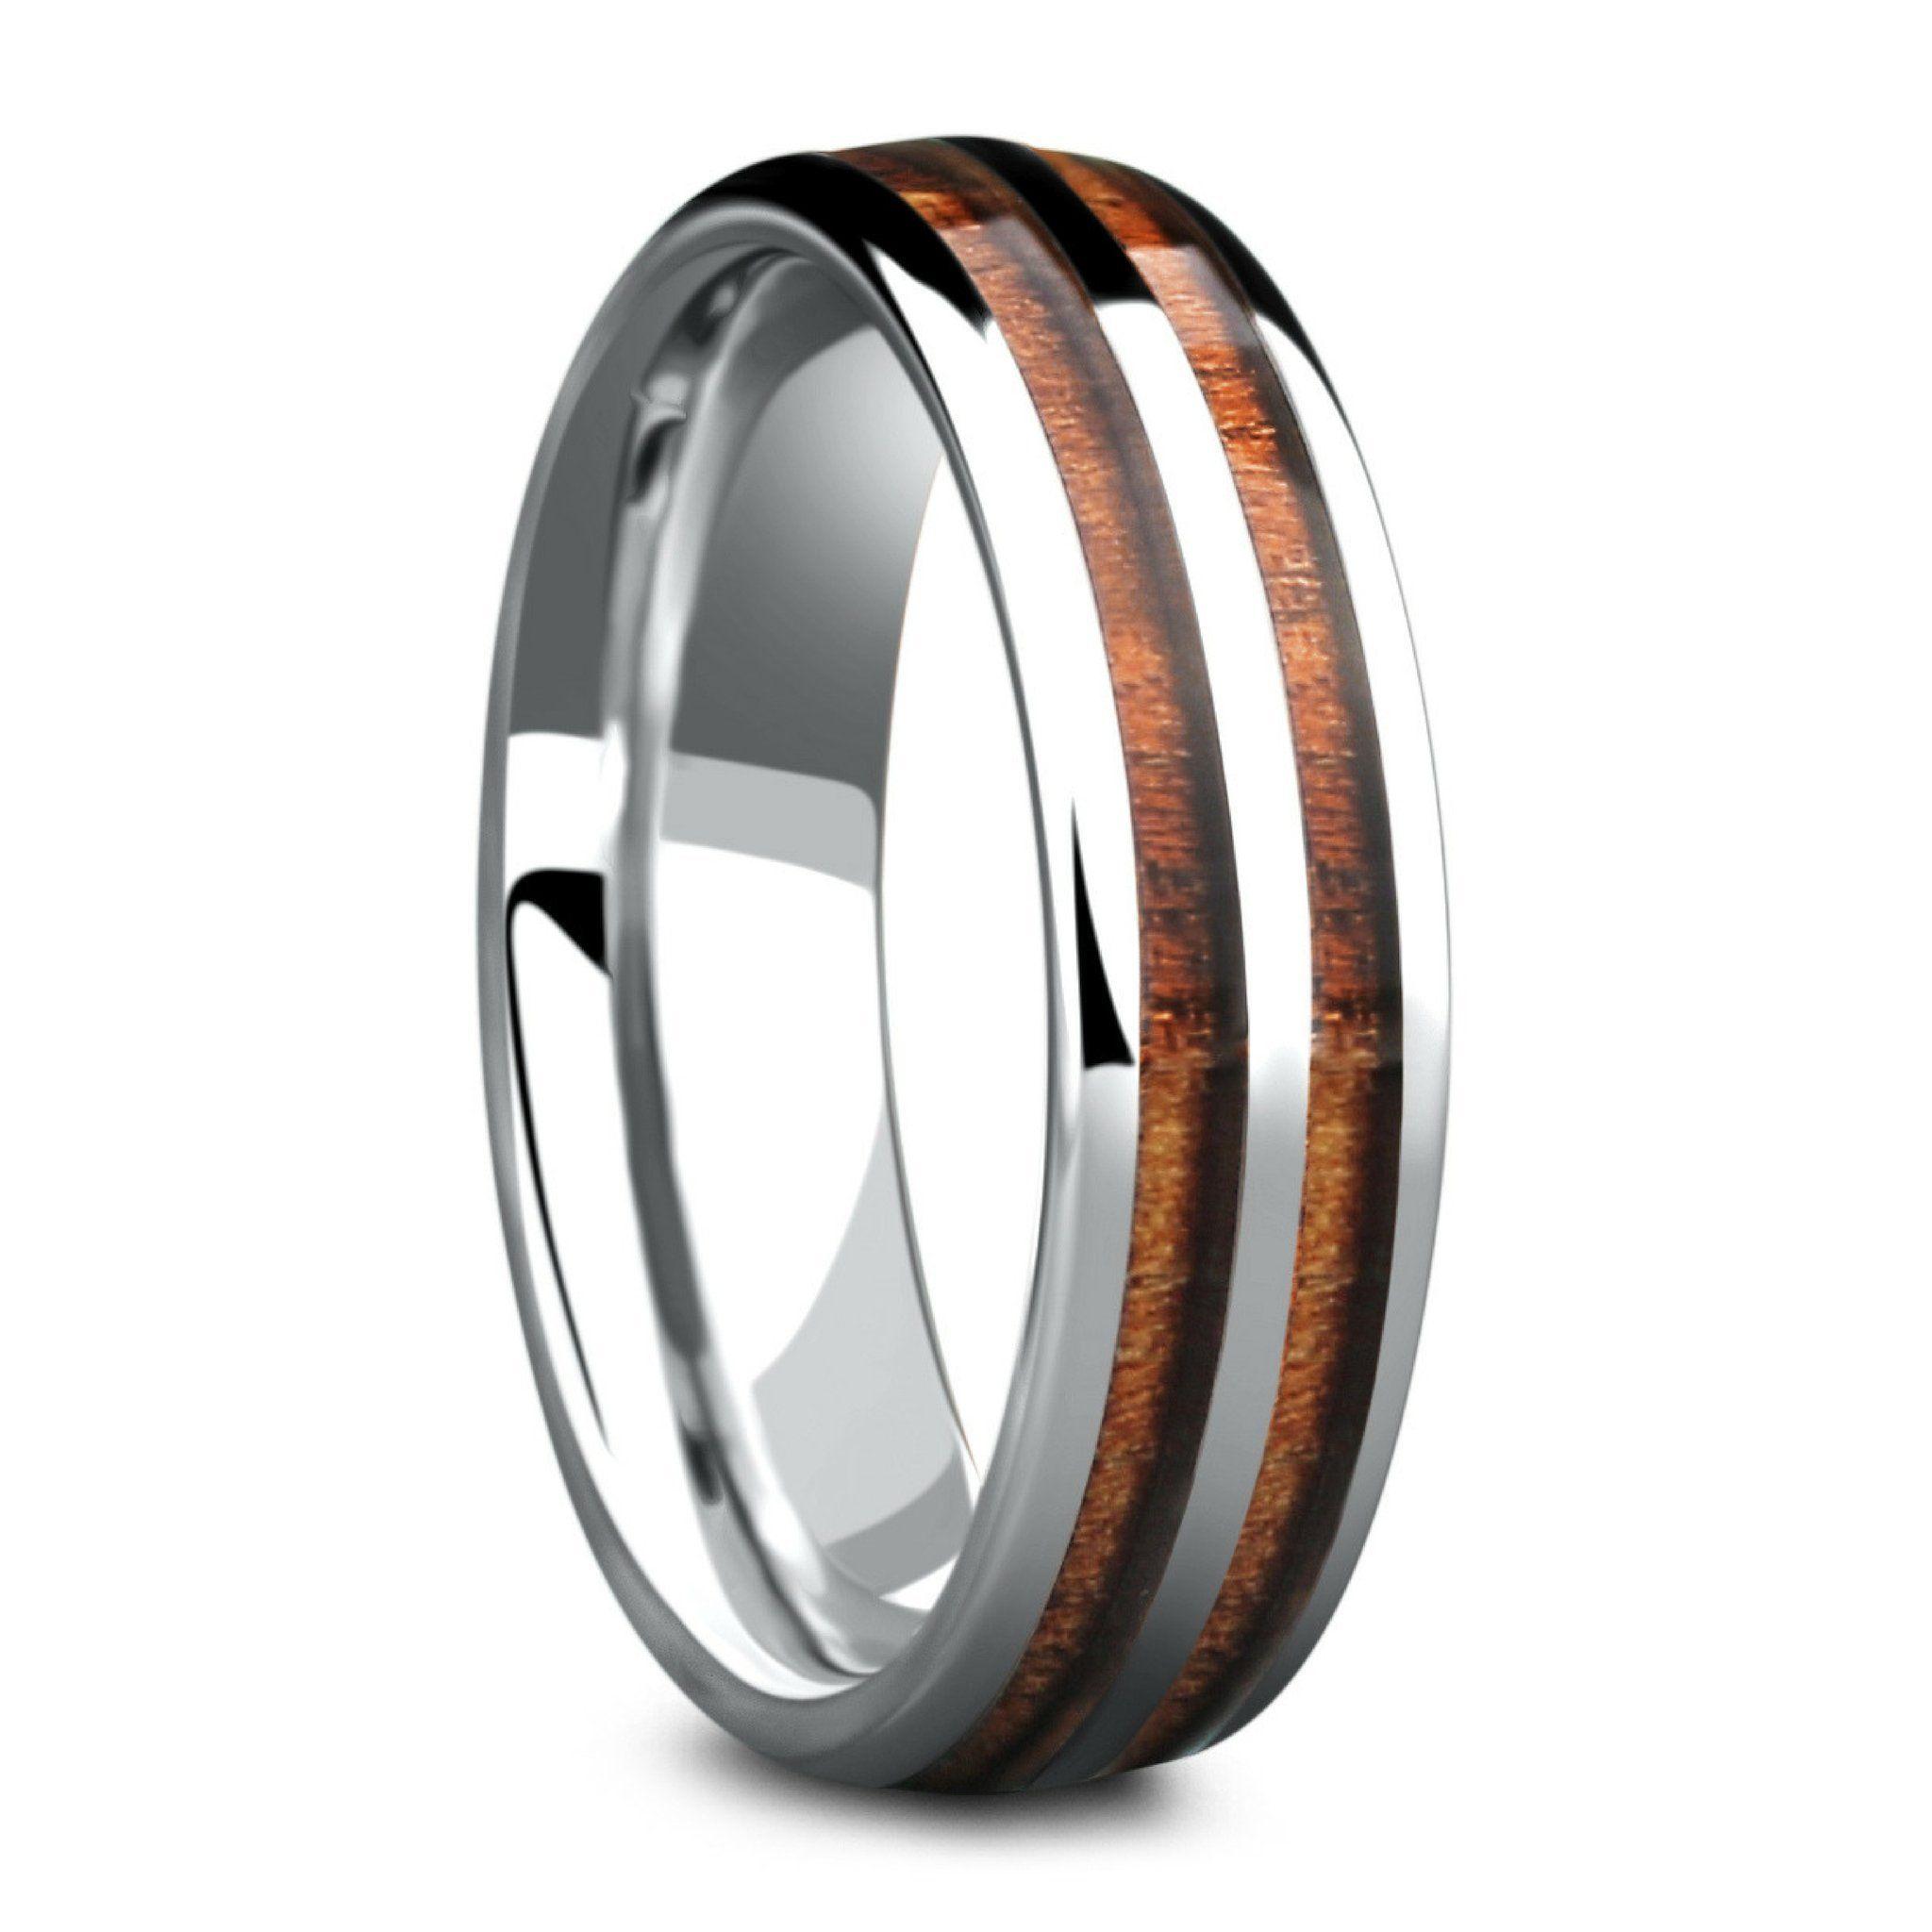 The Silver Wood Barrel Ring (6mm Width) Barrel rings